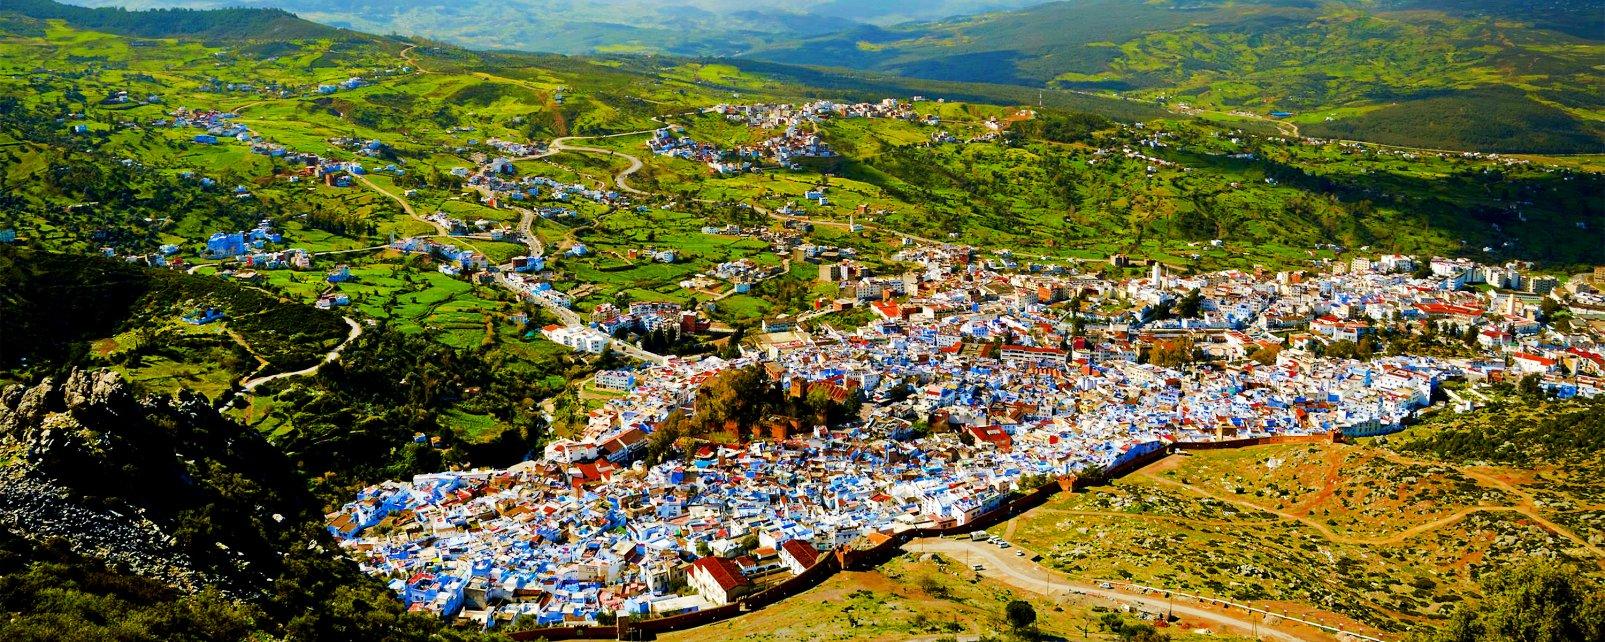 , Le Rif, Los paisajes, Marruecos del Norte